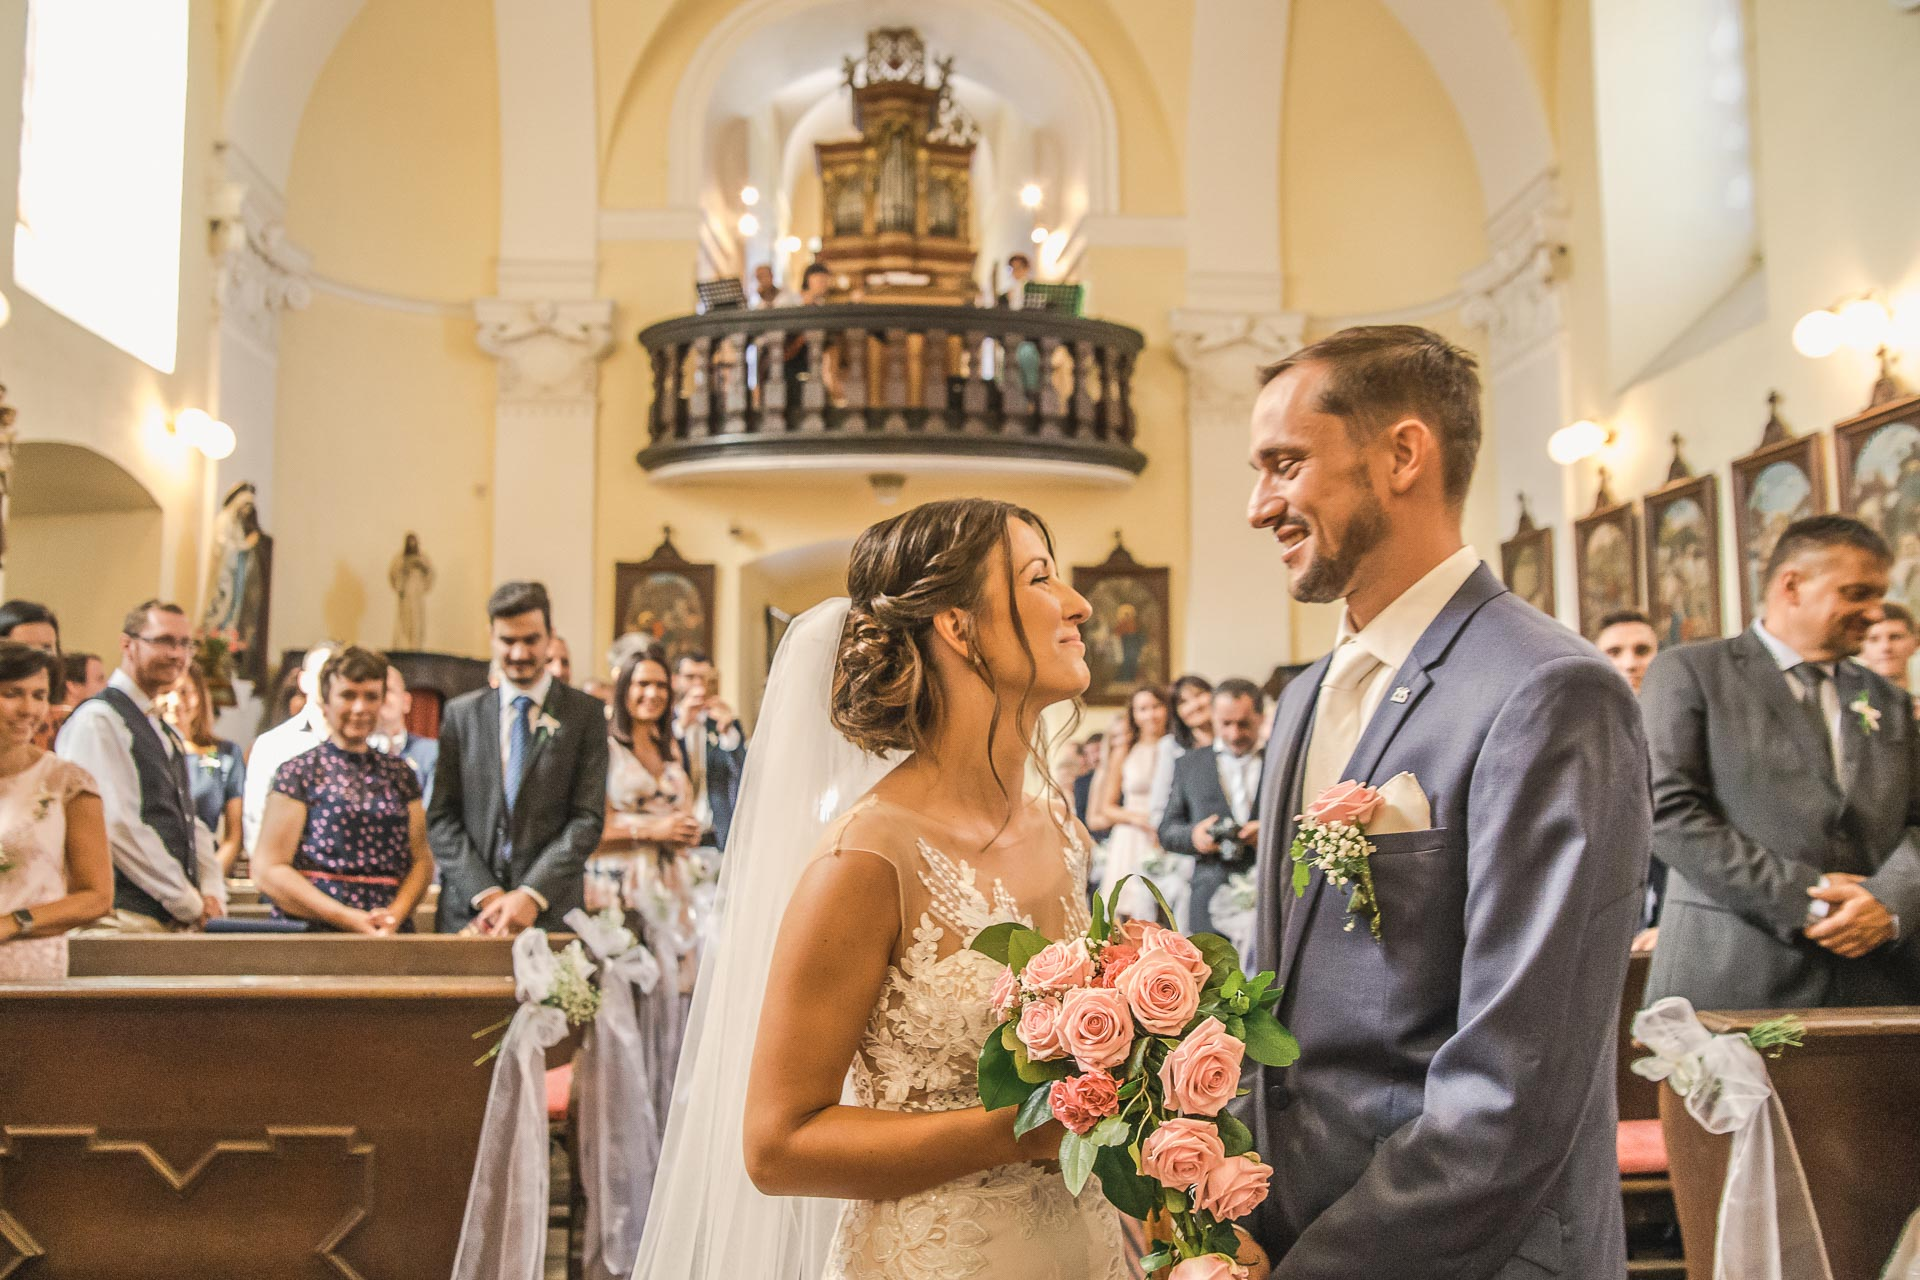 svatební-fotograf-wedding-svatebni-video-orlík-vltava-kostel-statek-stodola-boho-svatba-Beautyfoto-198